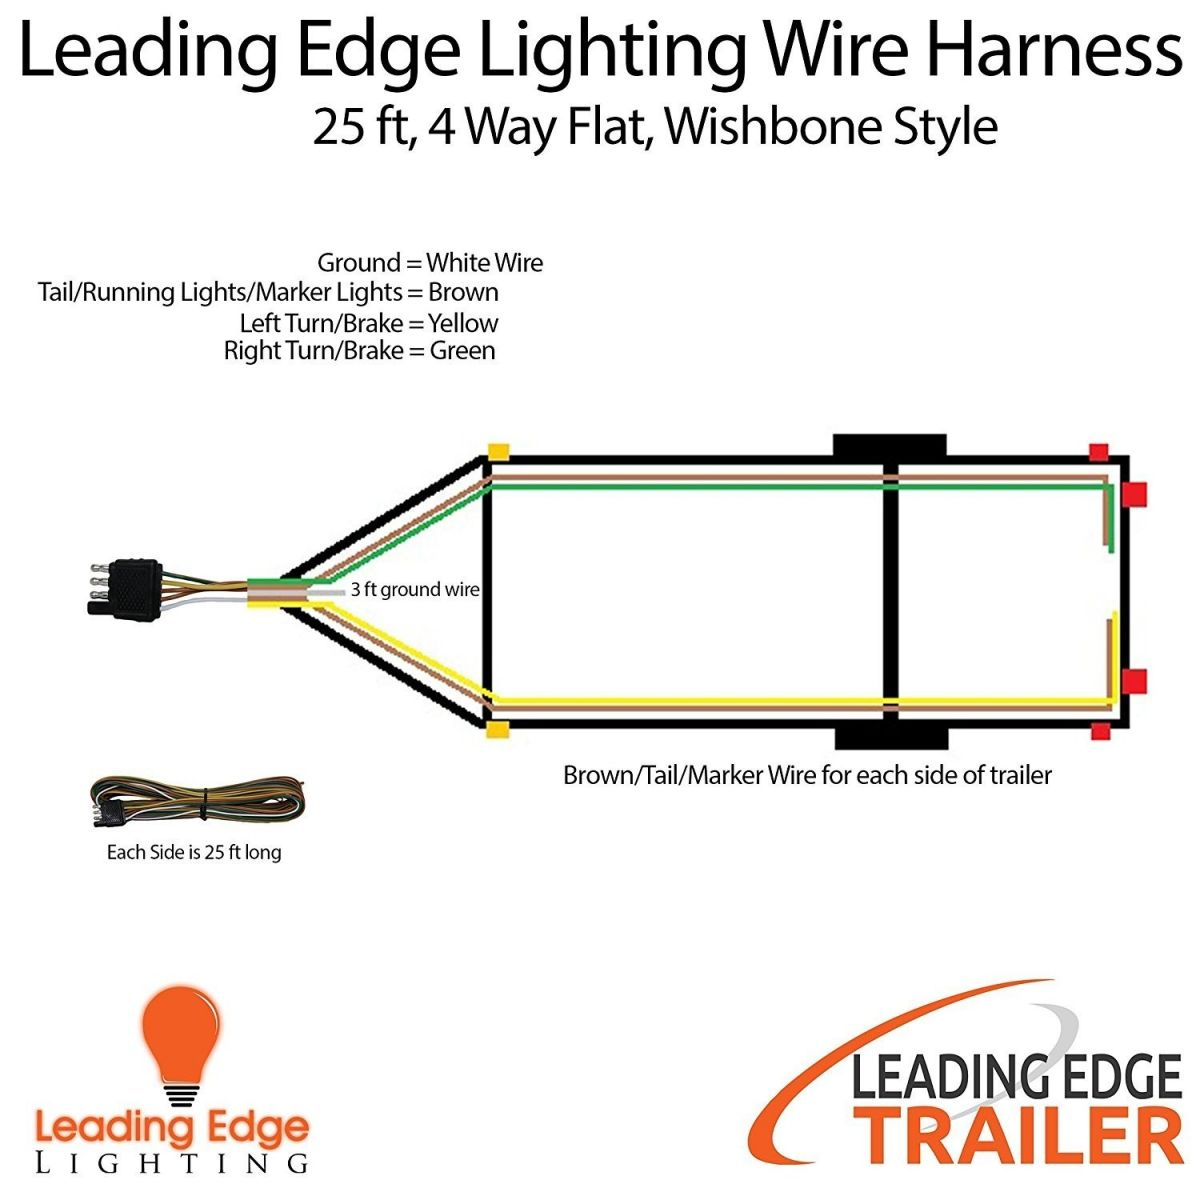 Best Of Boat Trailer Wiring Harness Diagram #ih34 – Documentaries - Boat Trailer Wiring Diagram